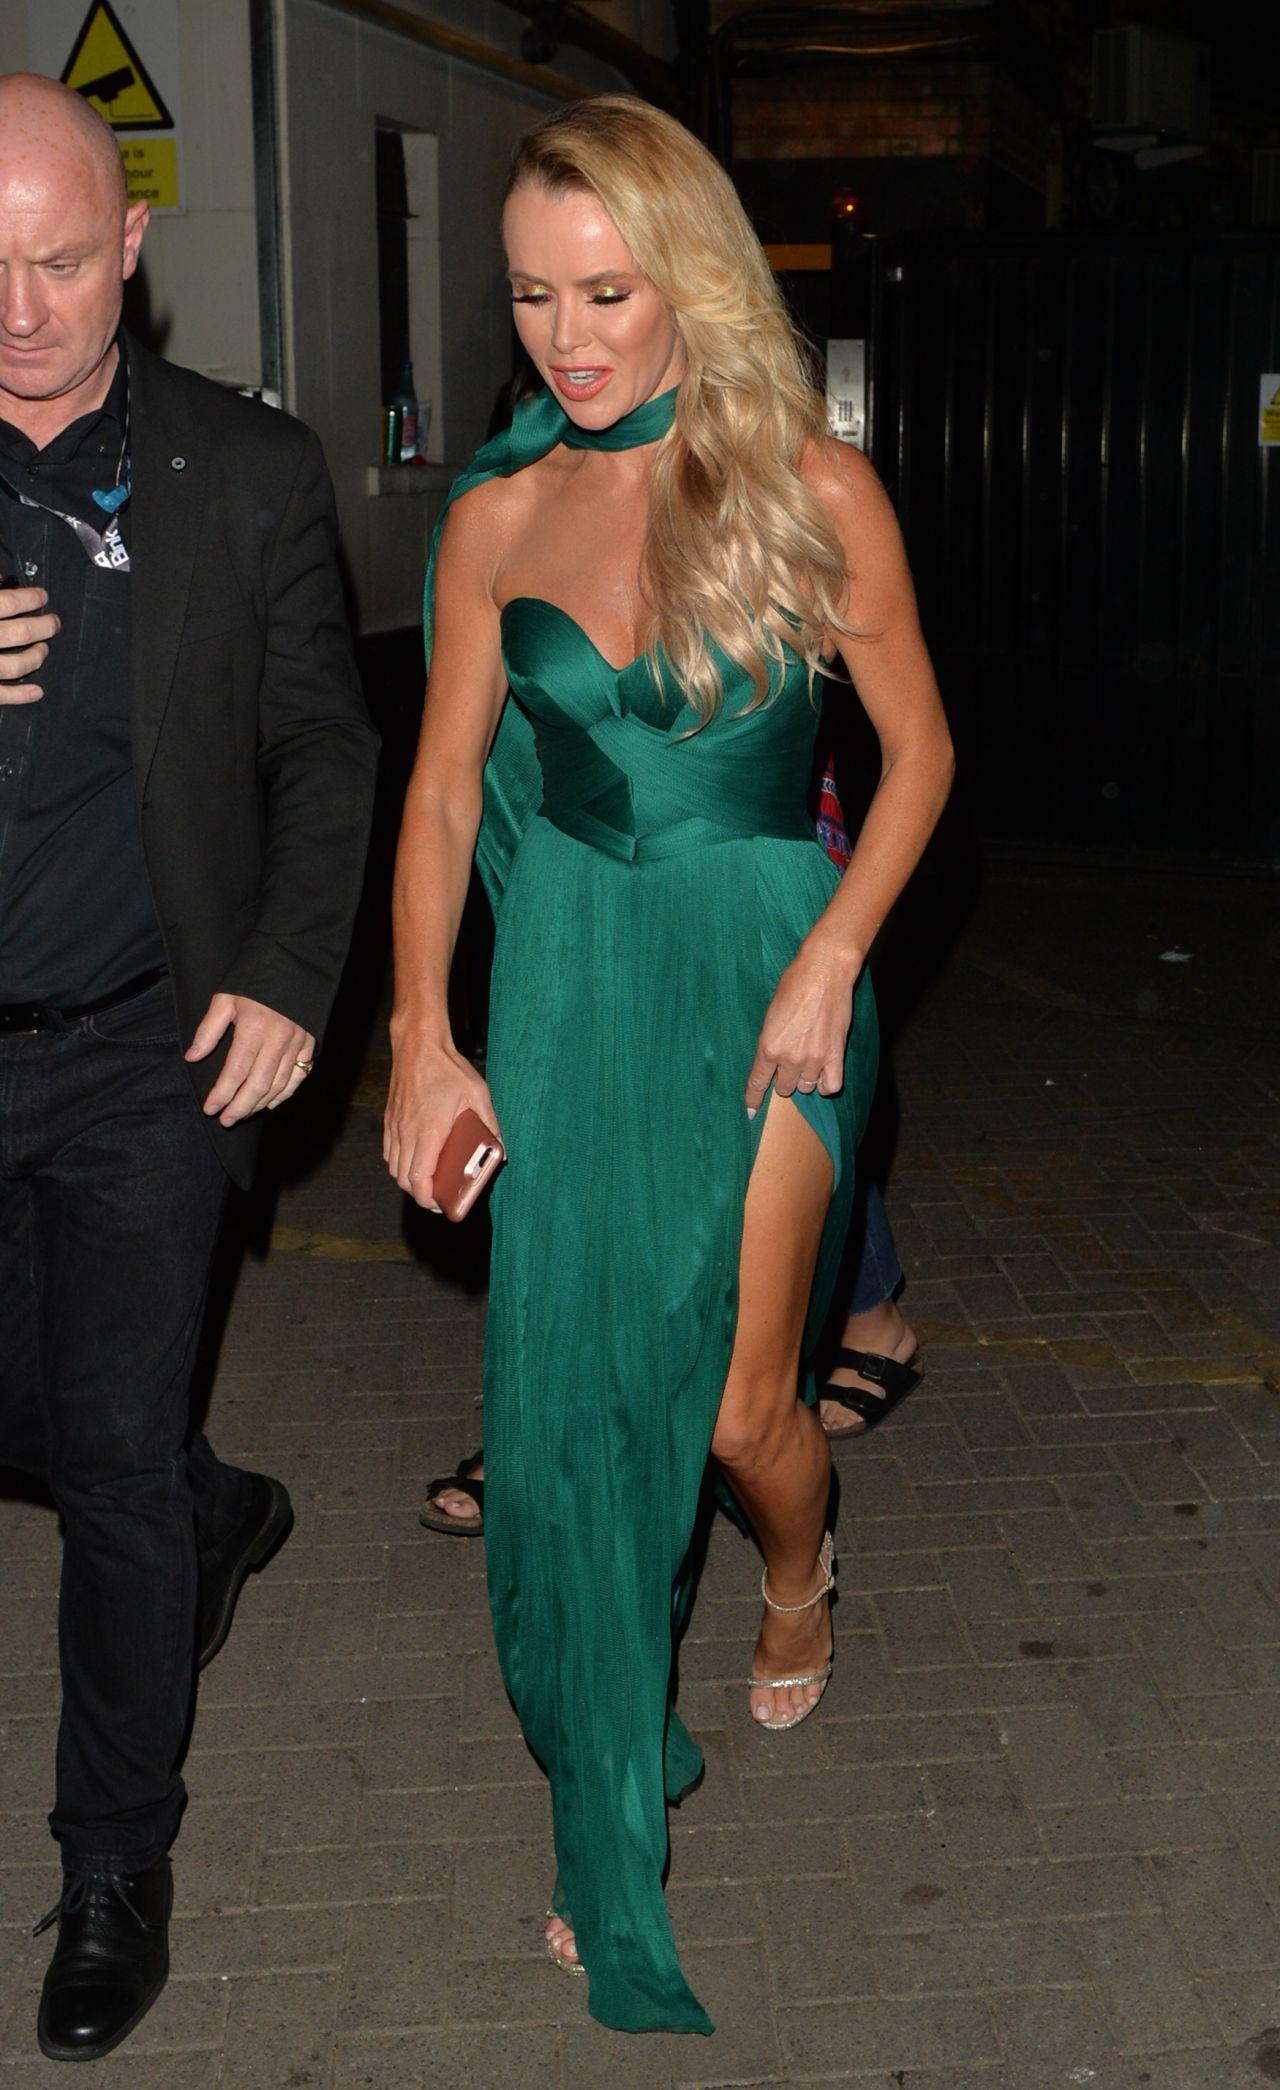 Amanda Holden Leaving The Apollo Theater In London 05 31